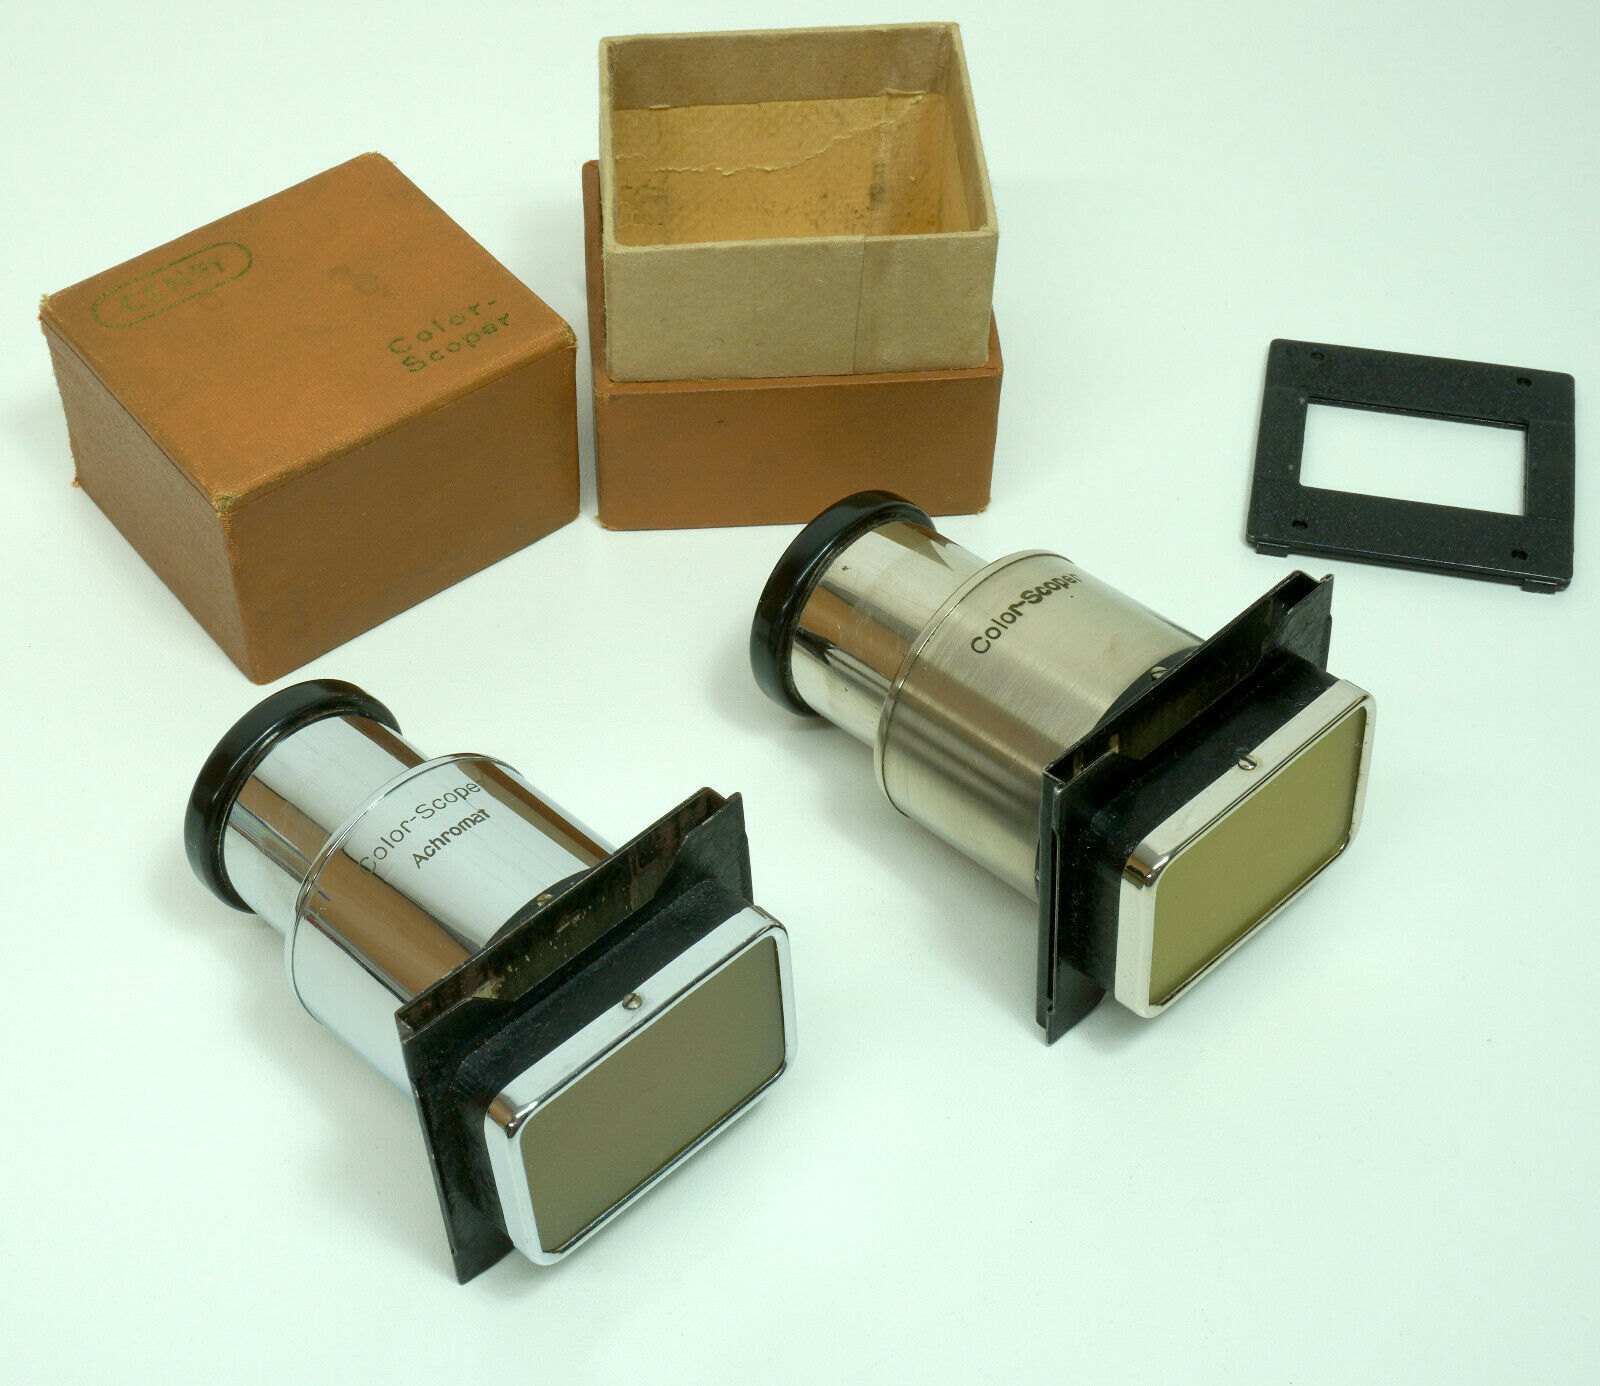 2 Stk. Diabetrachter CENEI Color scoper 1x Achromat in Originalverpackung Stereo